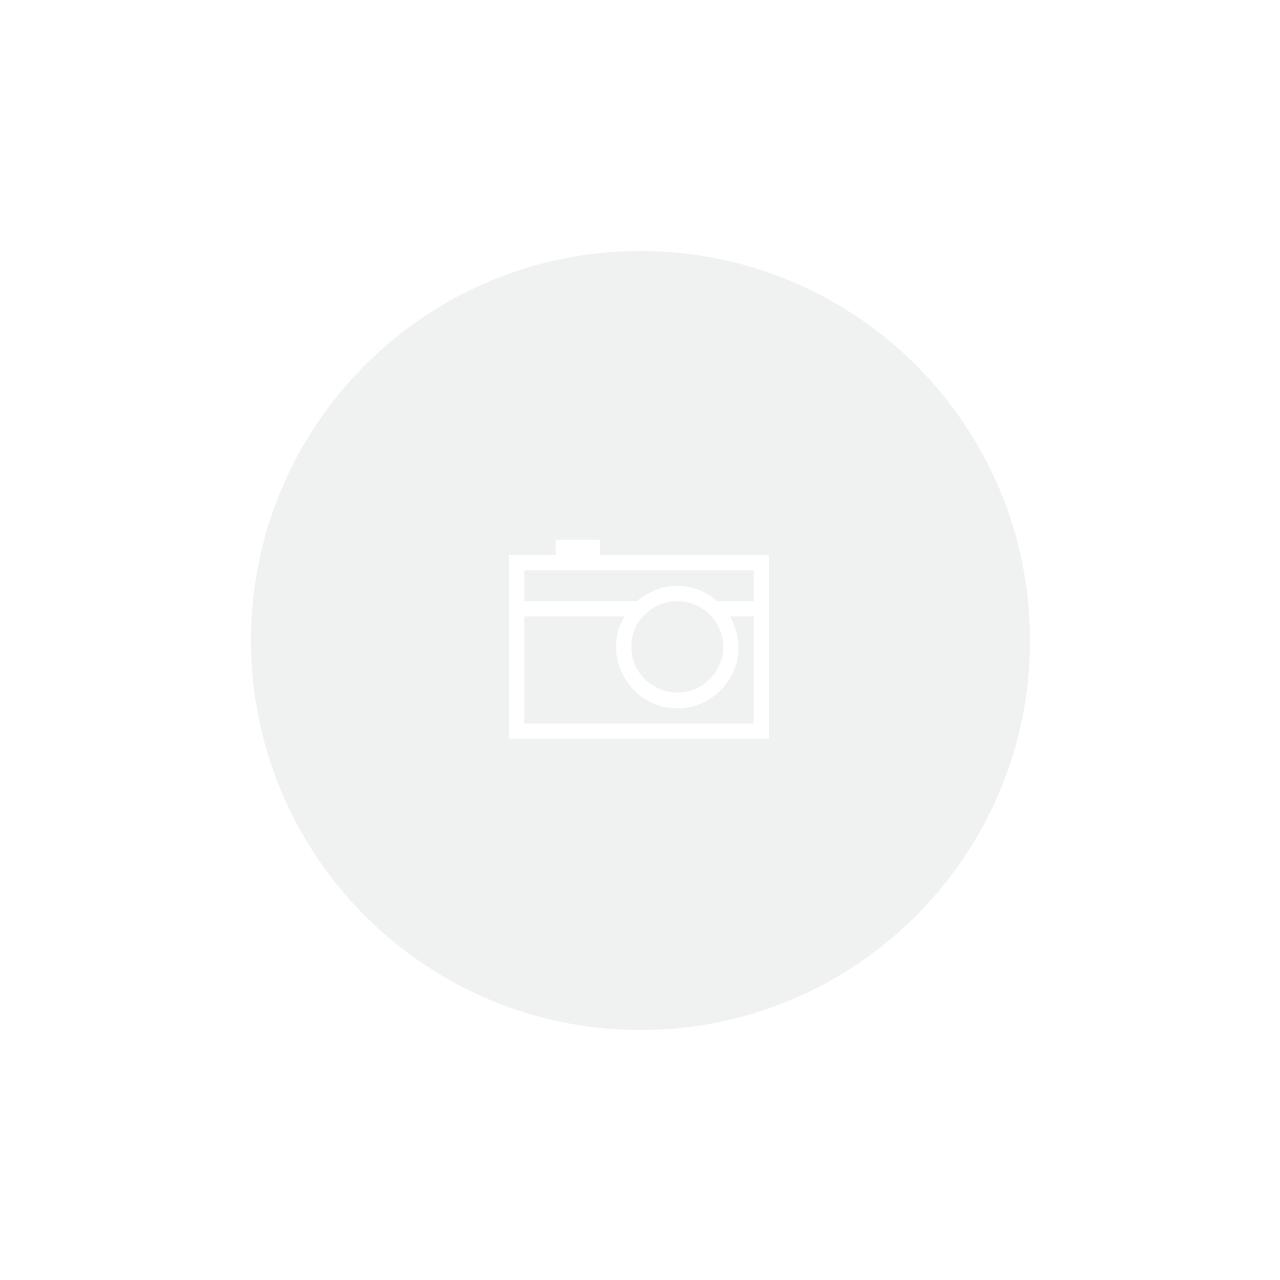 Jogo de Cama Casal Conf. Basic Premium cor Branco